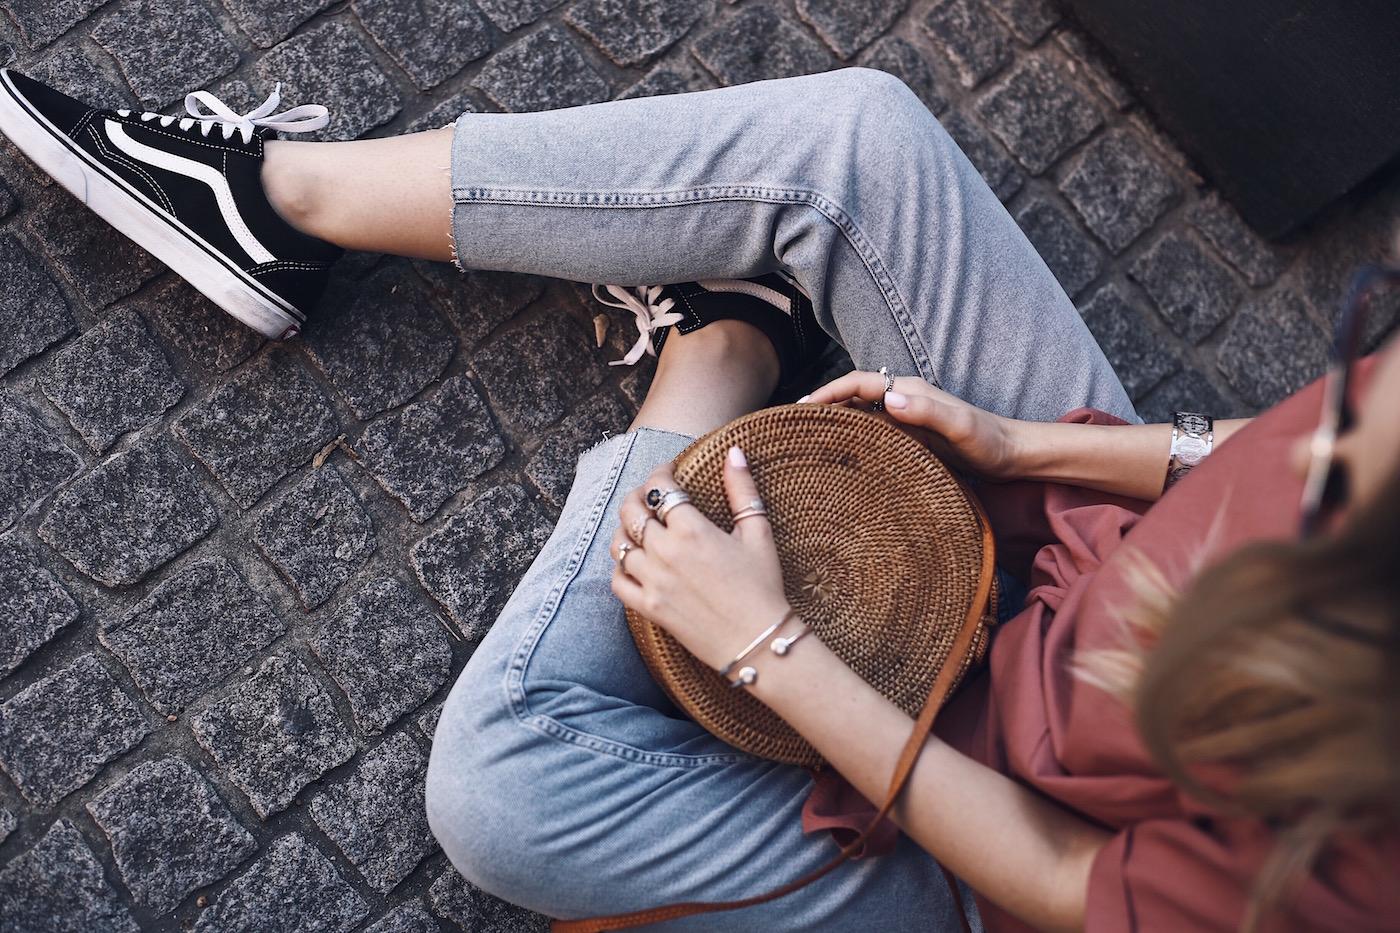 Vans Old Skool Outfit Casual Summer 2017 Street Style Want Get Repeat Fashion Blog Erlangen Nürnberg